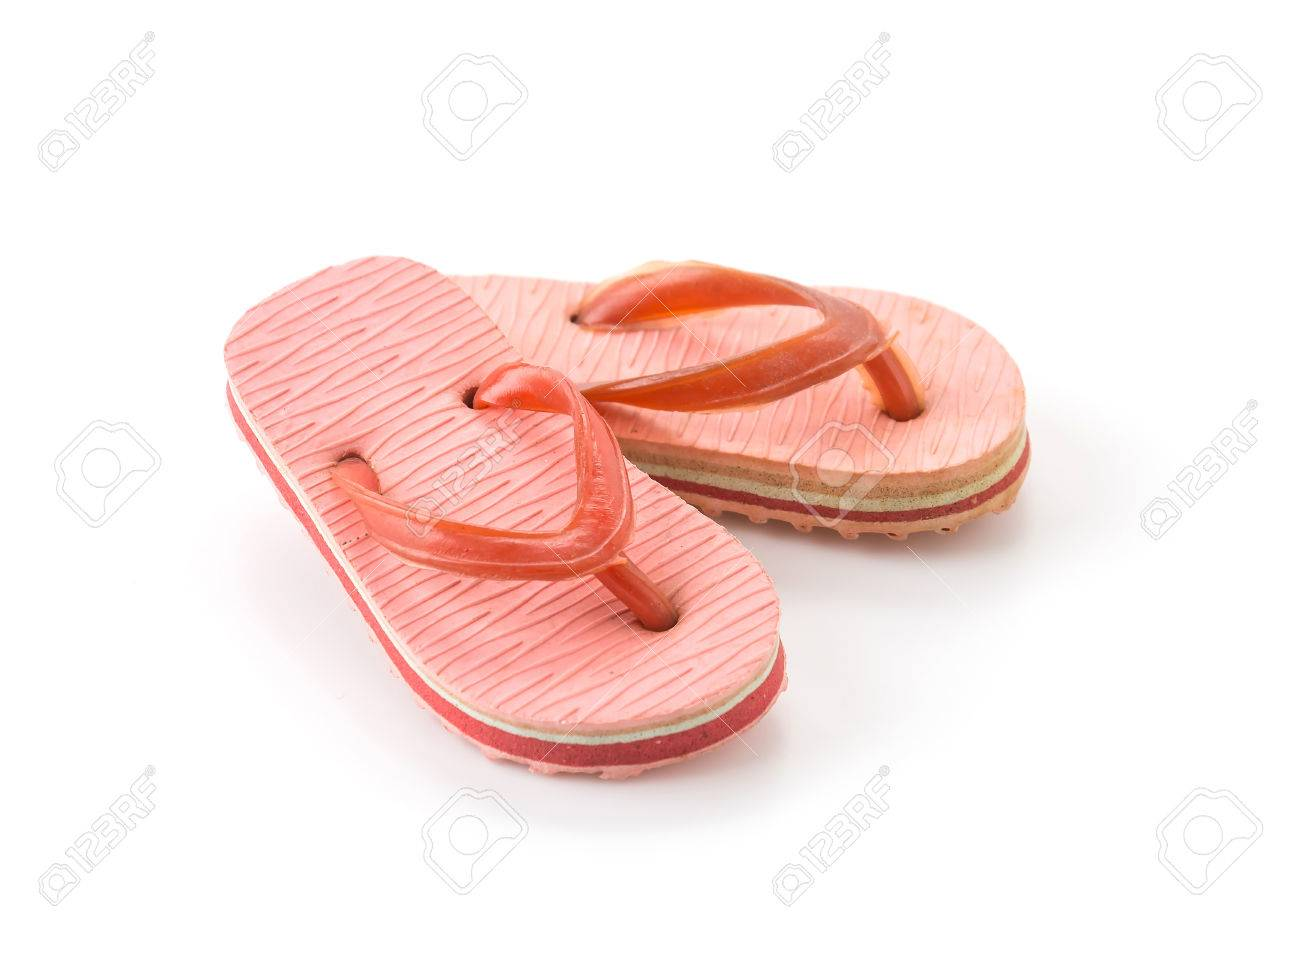 c30a555afee9c mini sandal on white background Stock Photo - 45459624